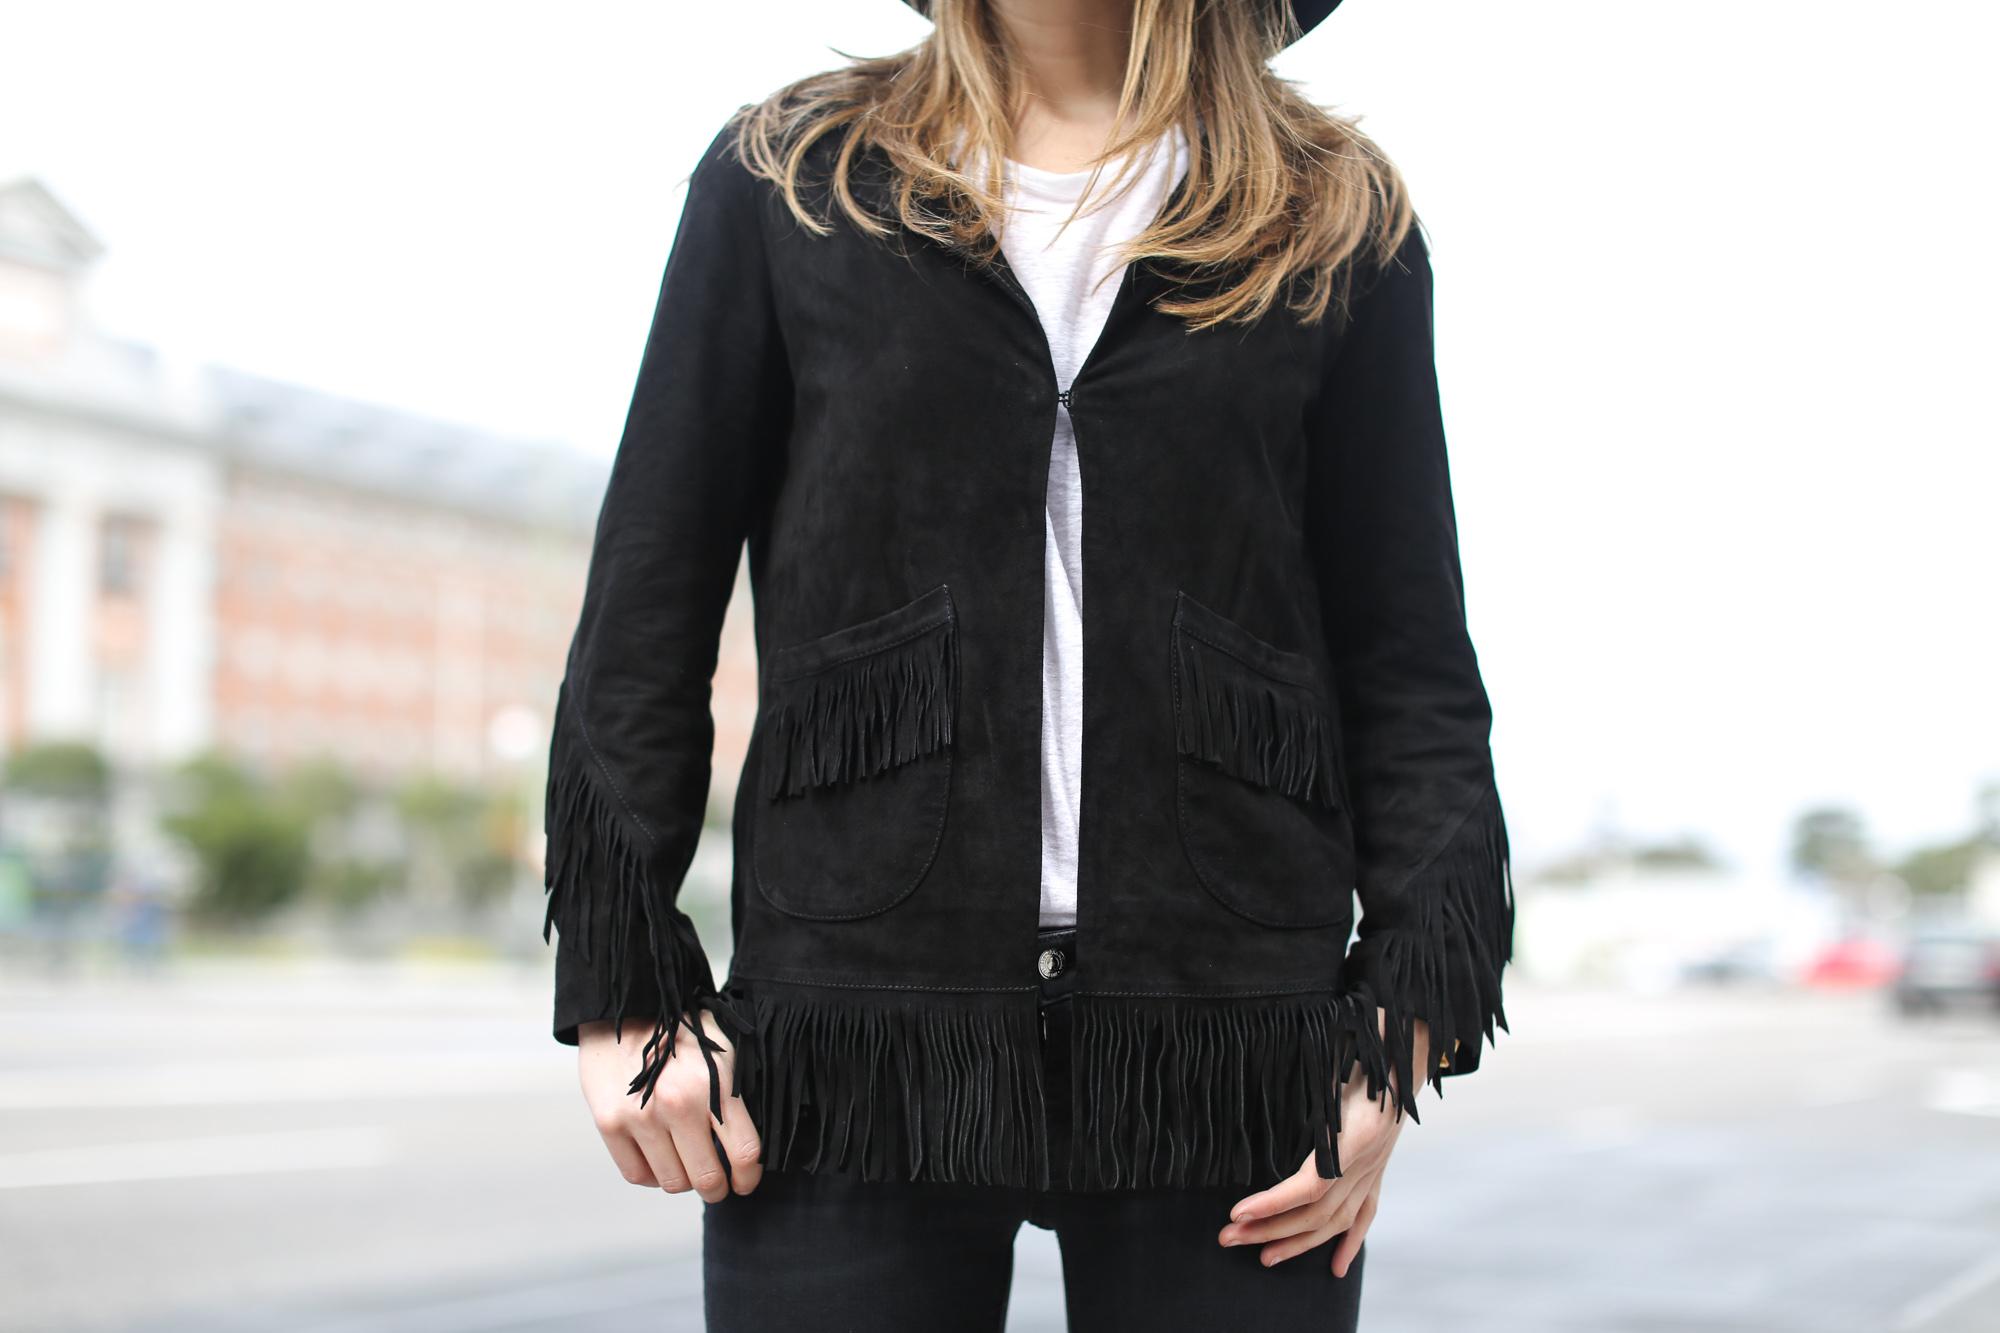 Clochet-streetstyle-zara-flared-jeans-celine-trio-bag-8